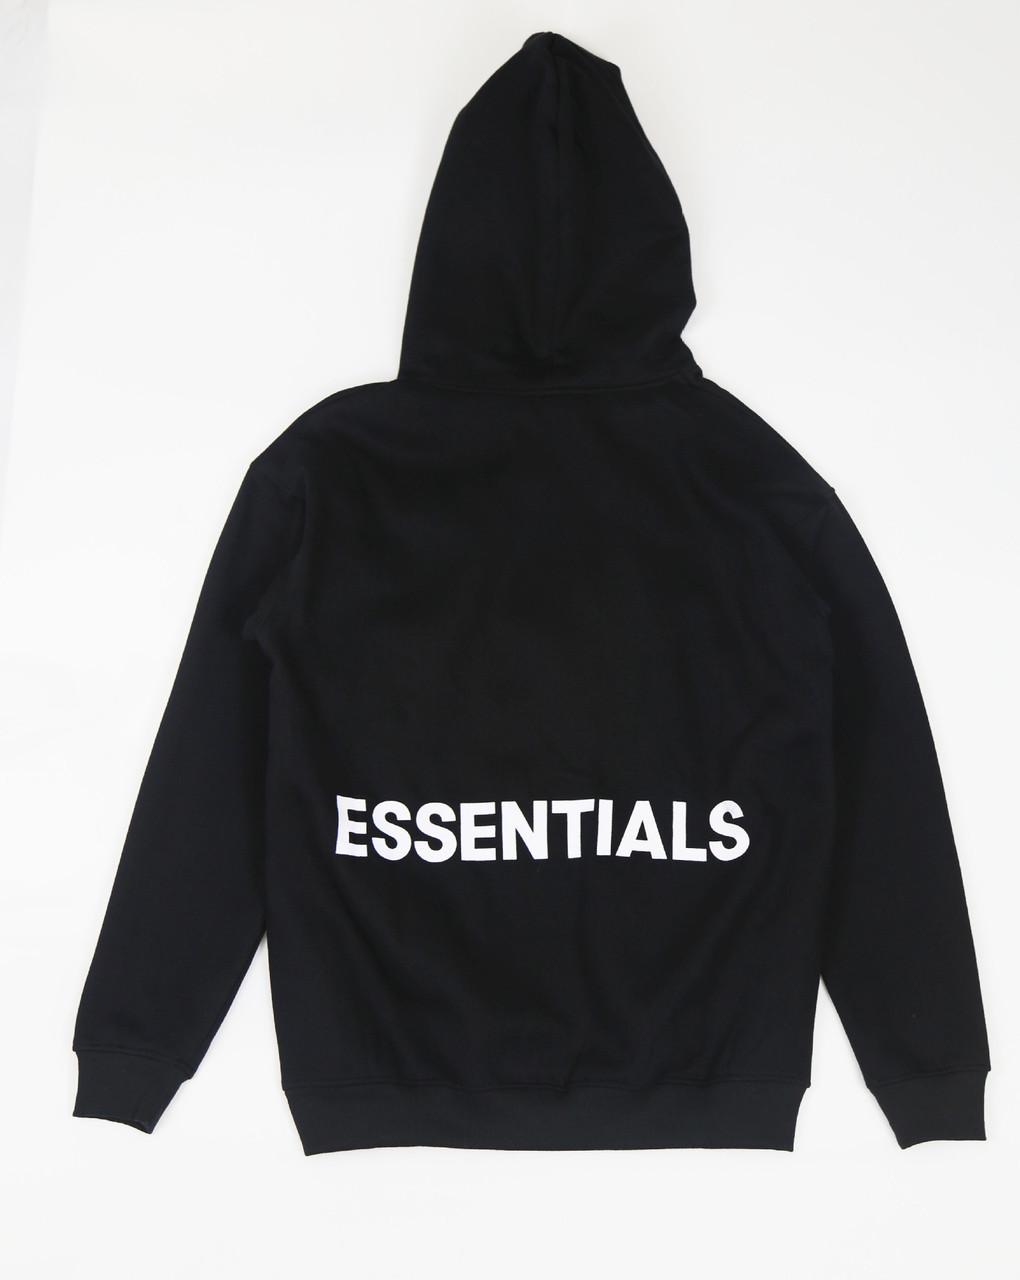 Чорне худі Fear Of God Essentials Logo, унісекс